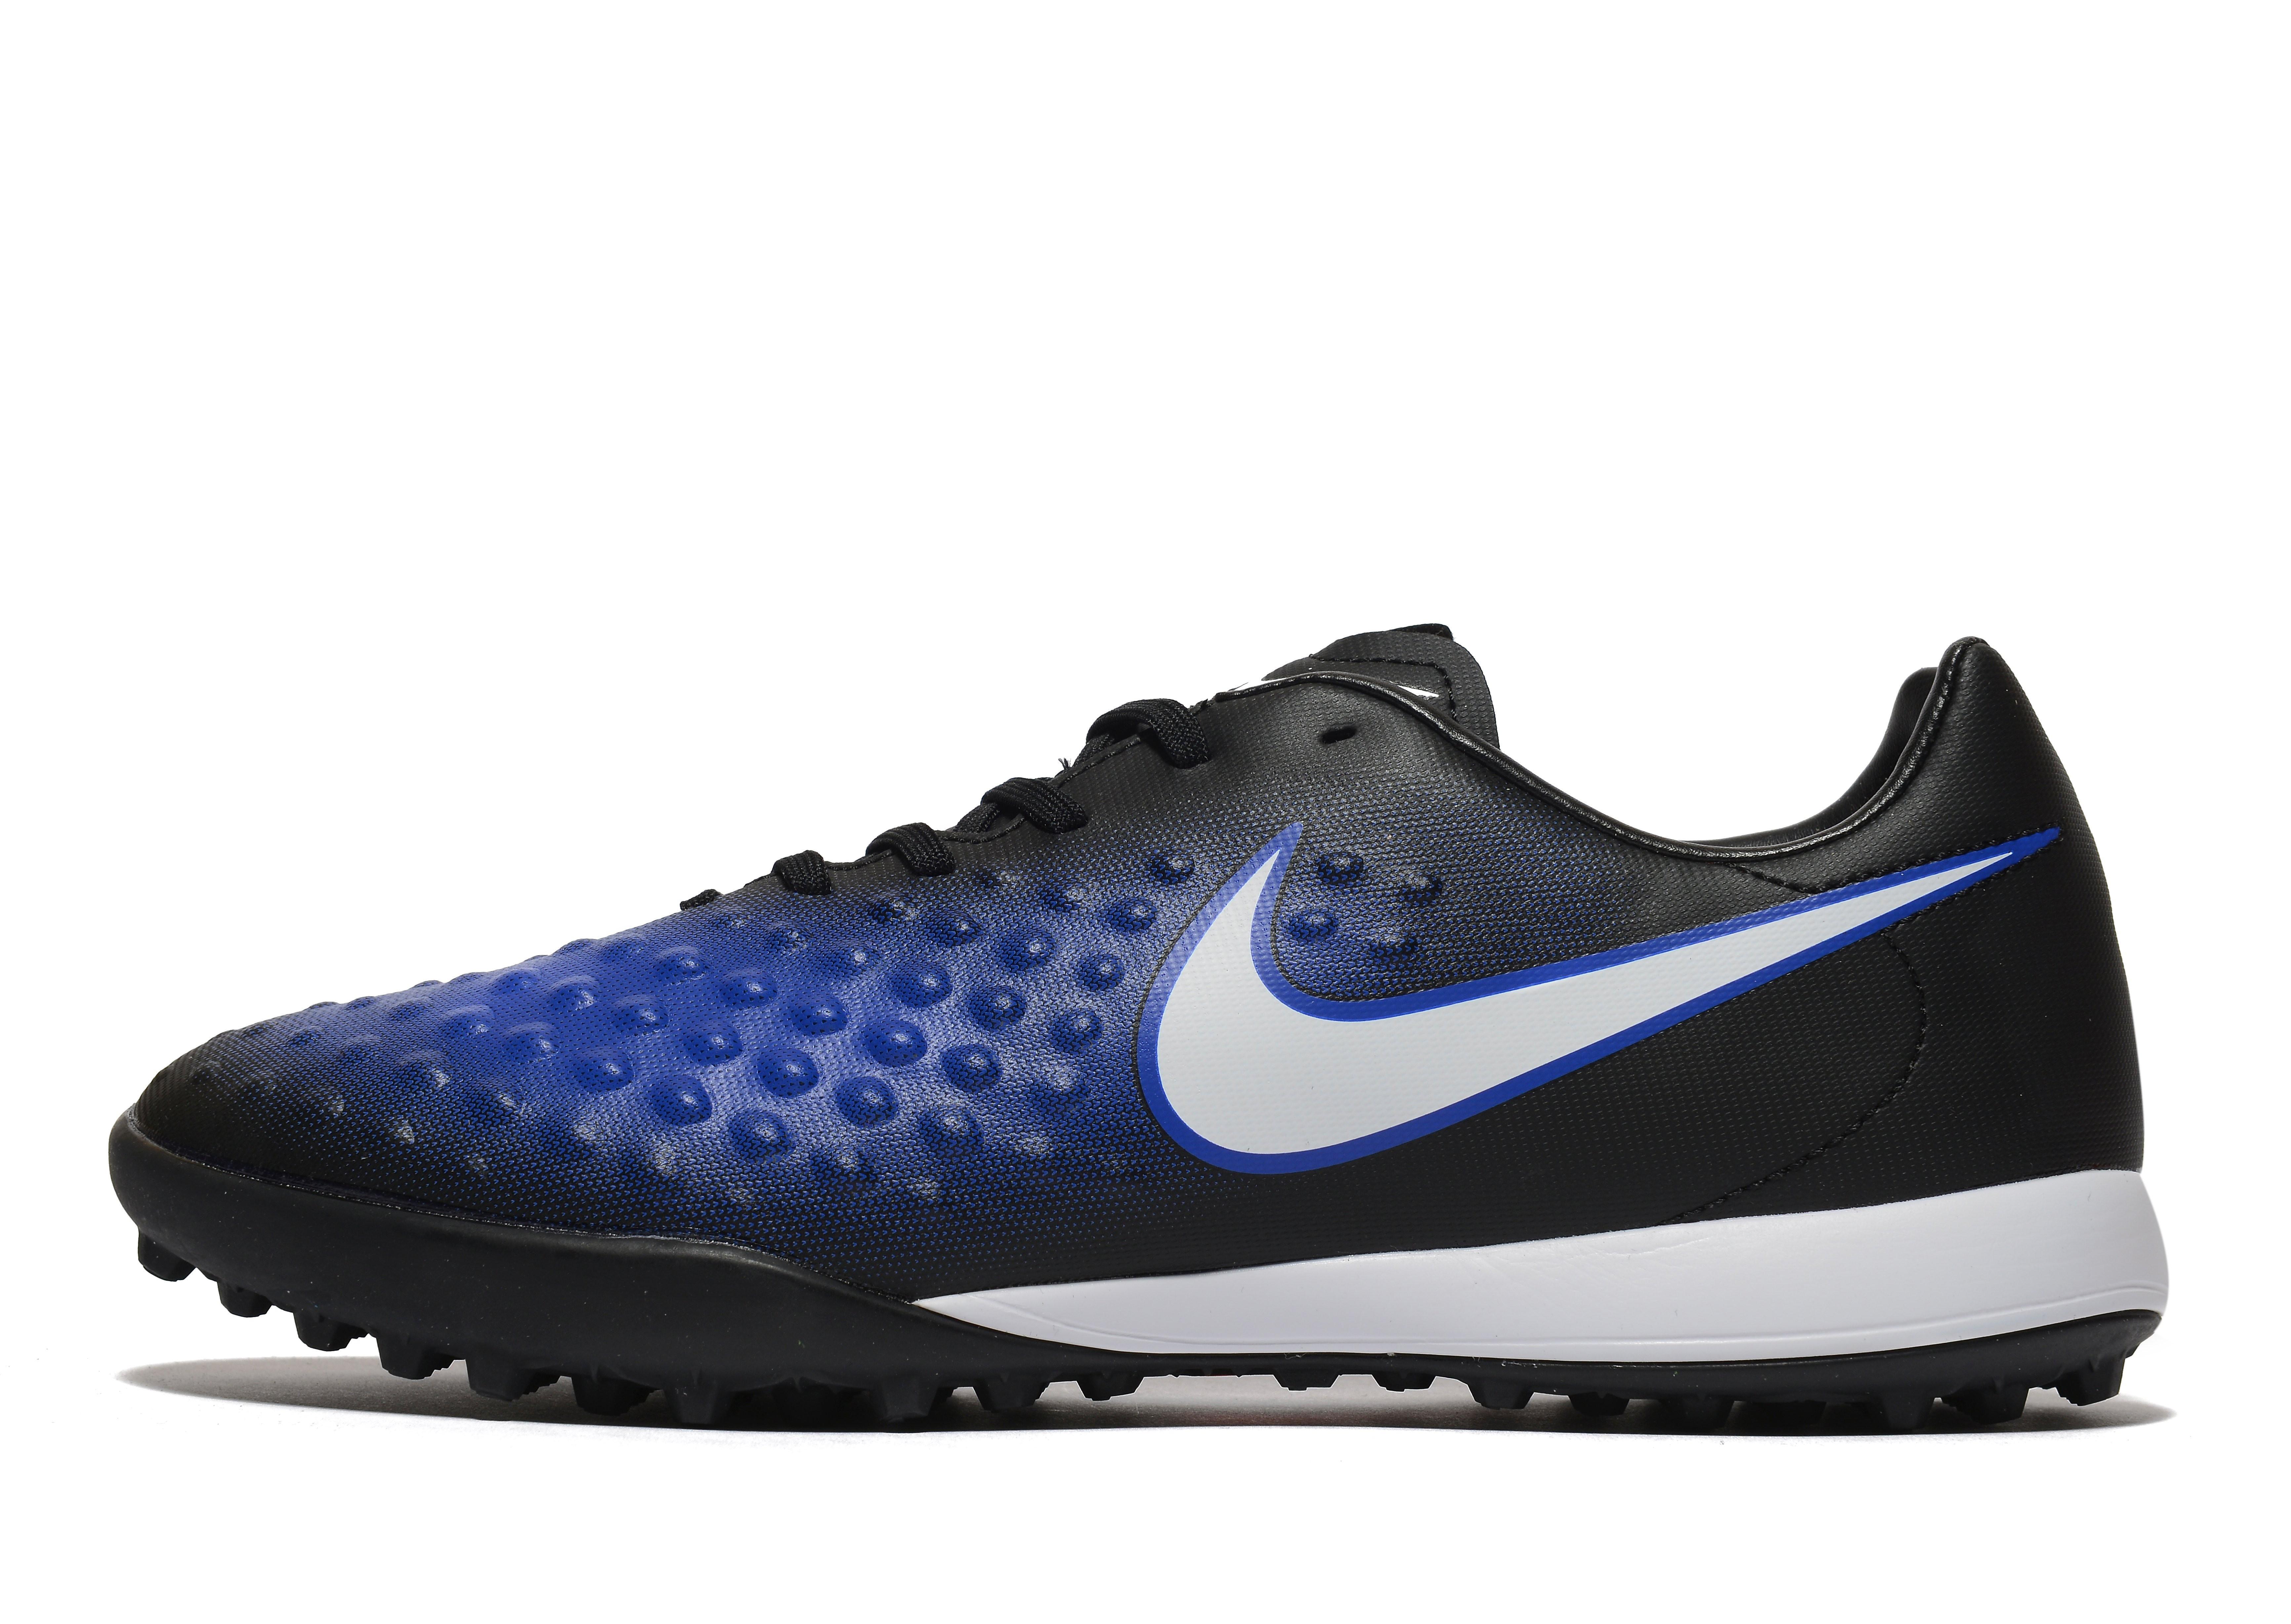 Nike MagistaX Onda II Turf